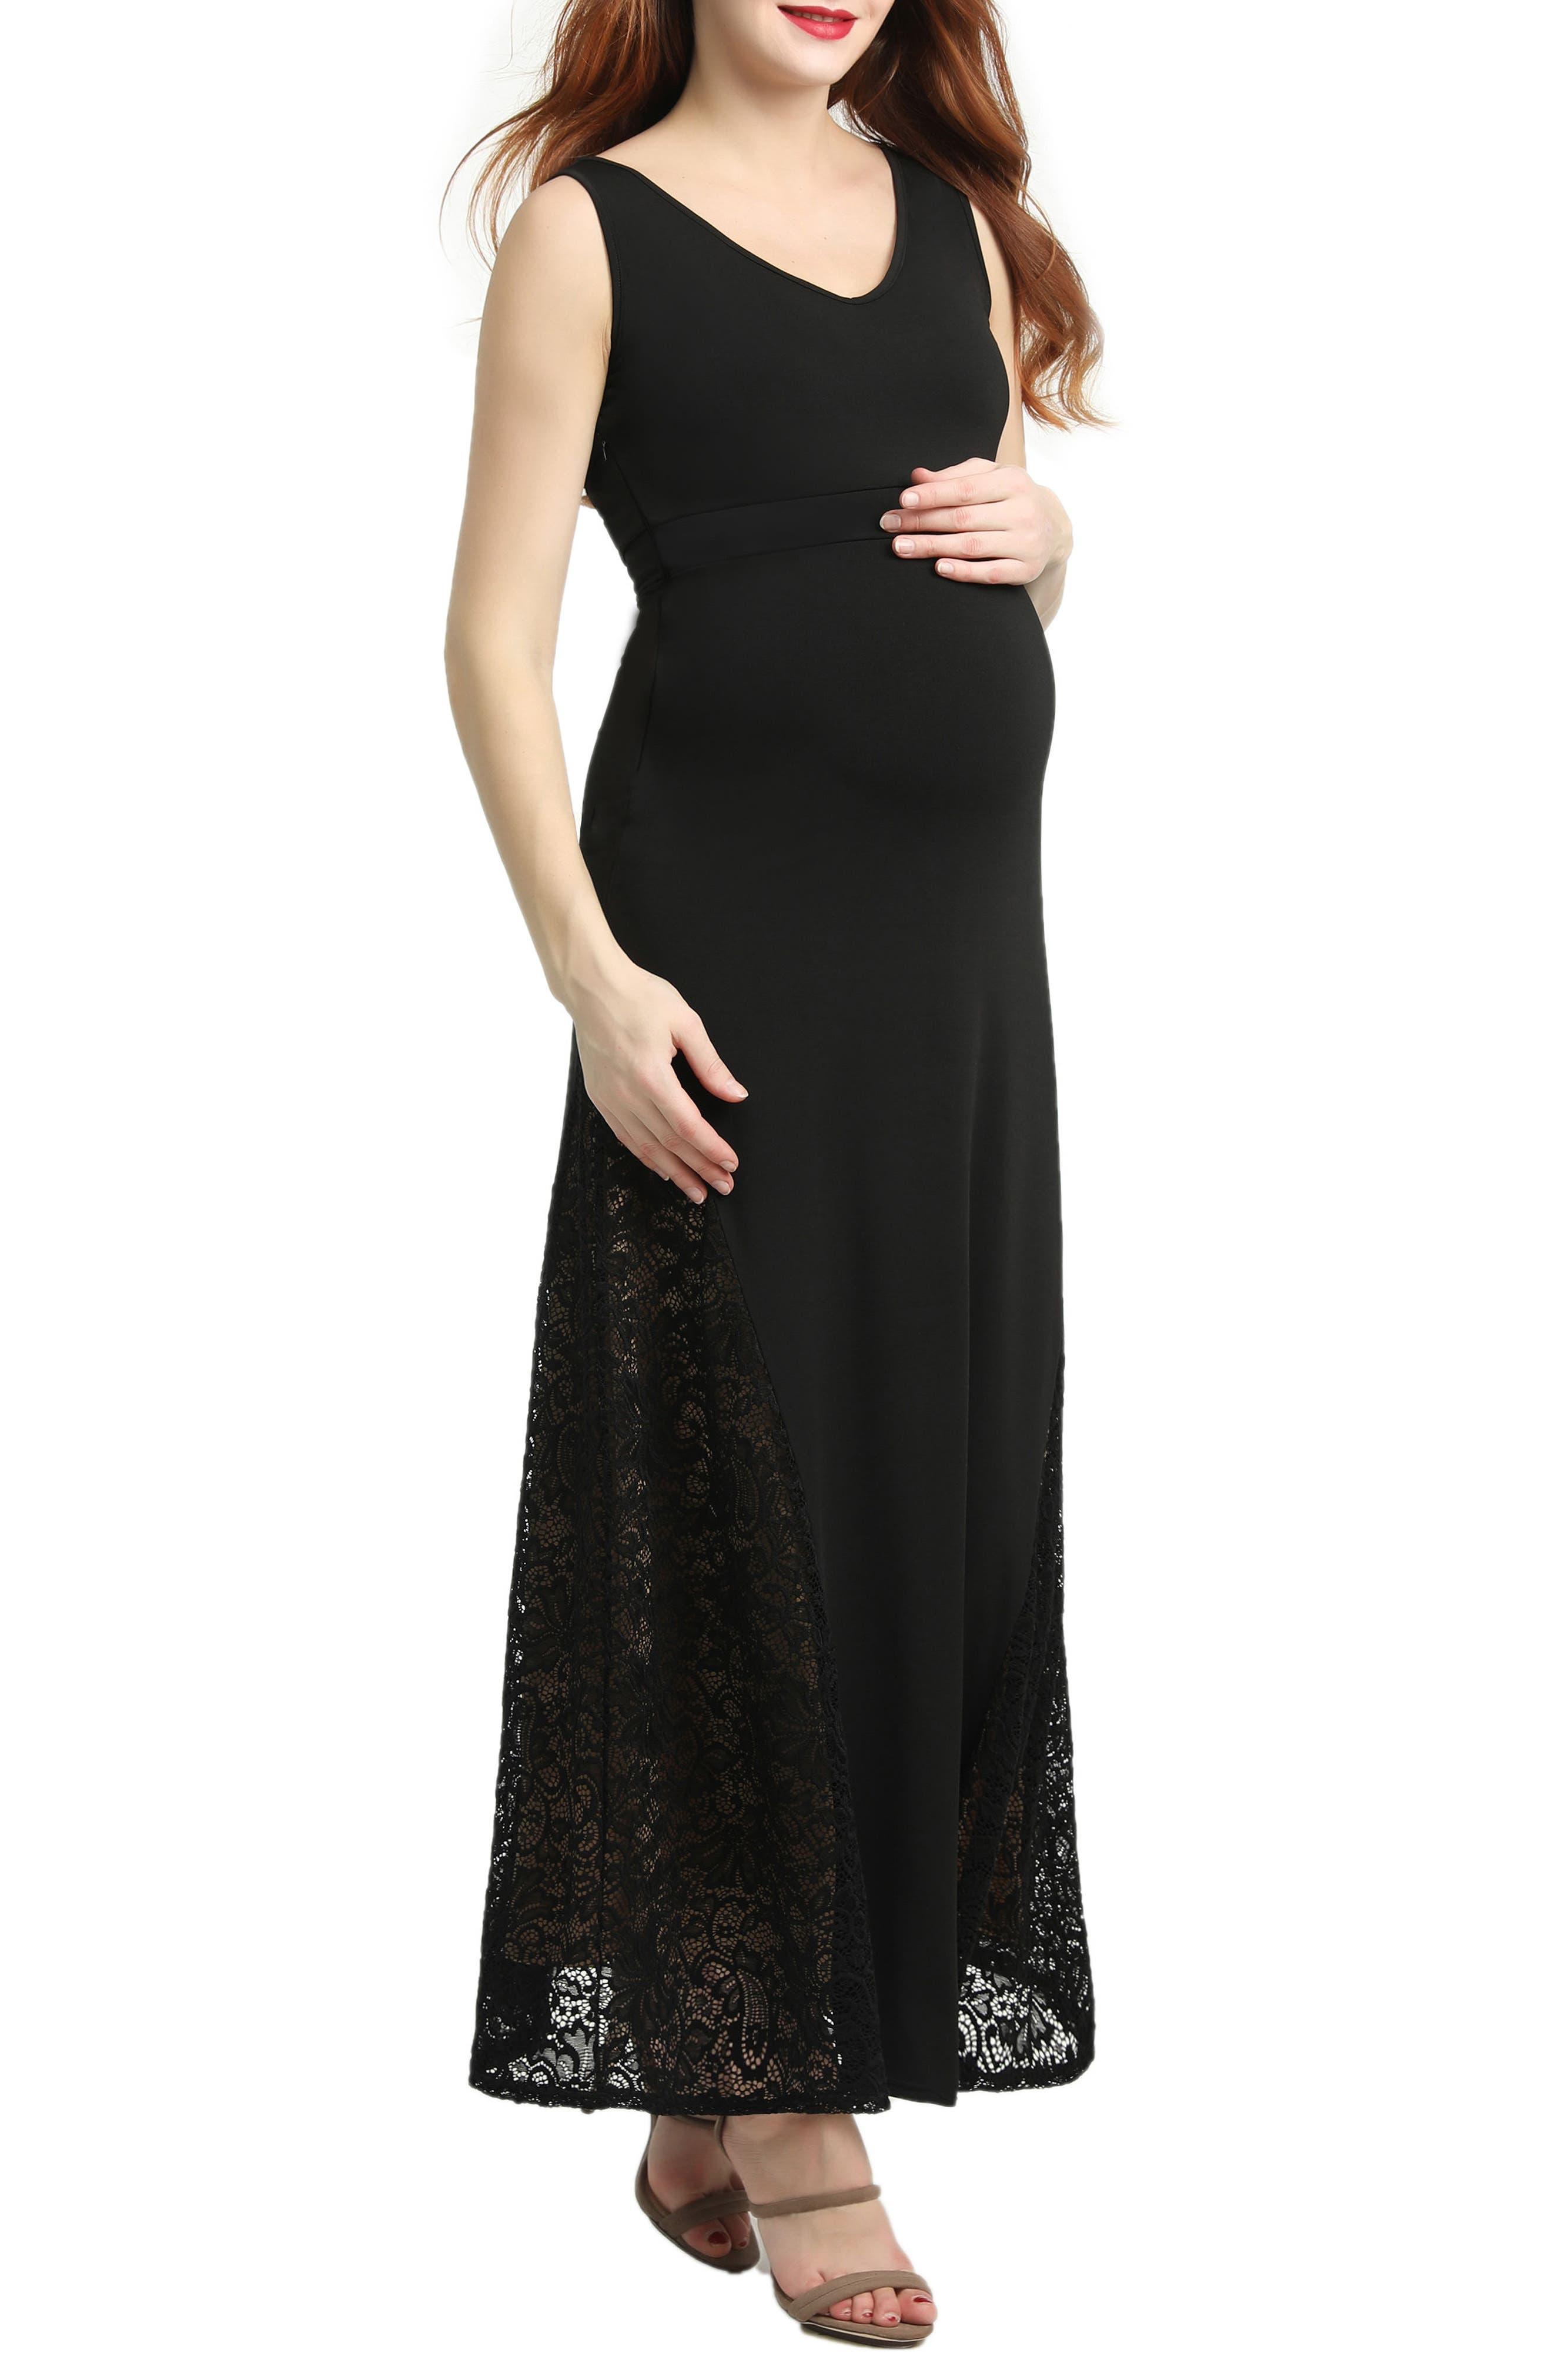 Kimi And Kai Elizabeth Lace Maternity Maxi Dress, Black